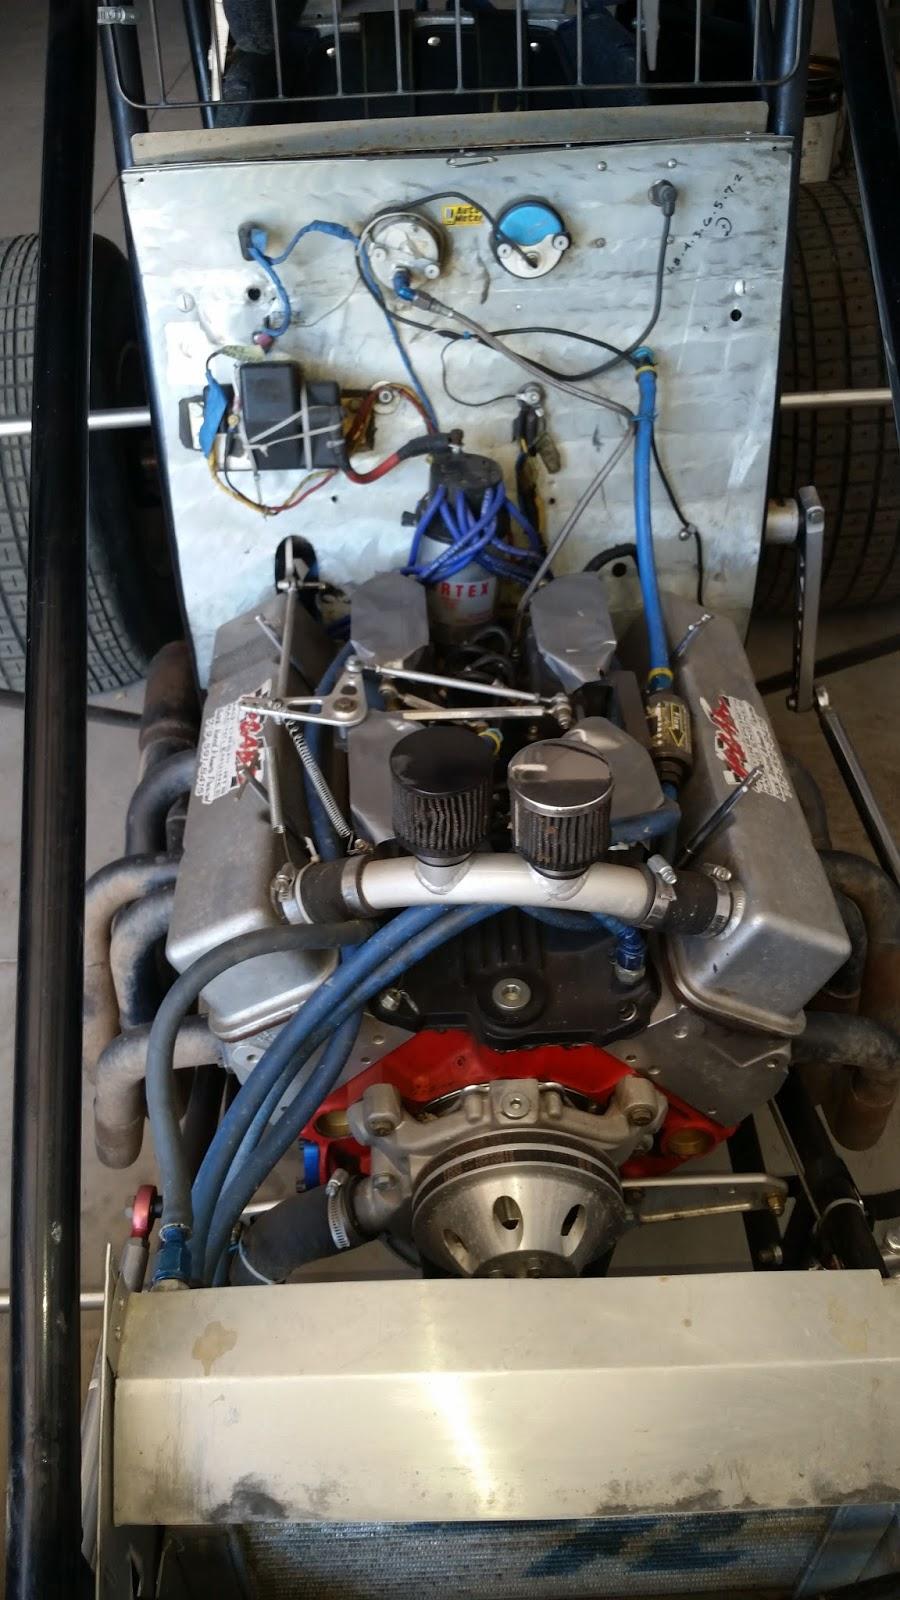 305_engine3 justin wolf medlock for sale urss imca racesaver 305 sprint car sold